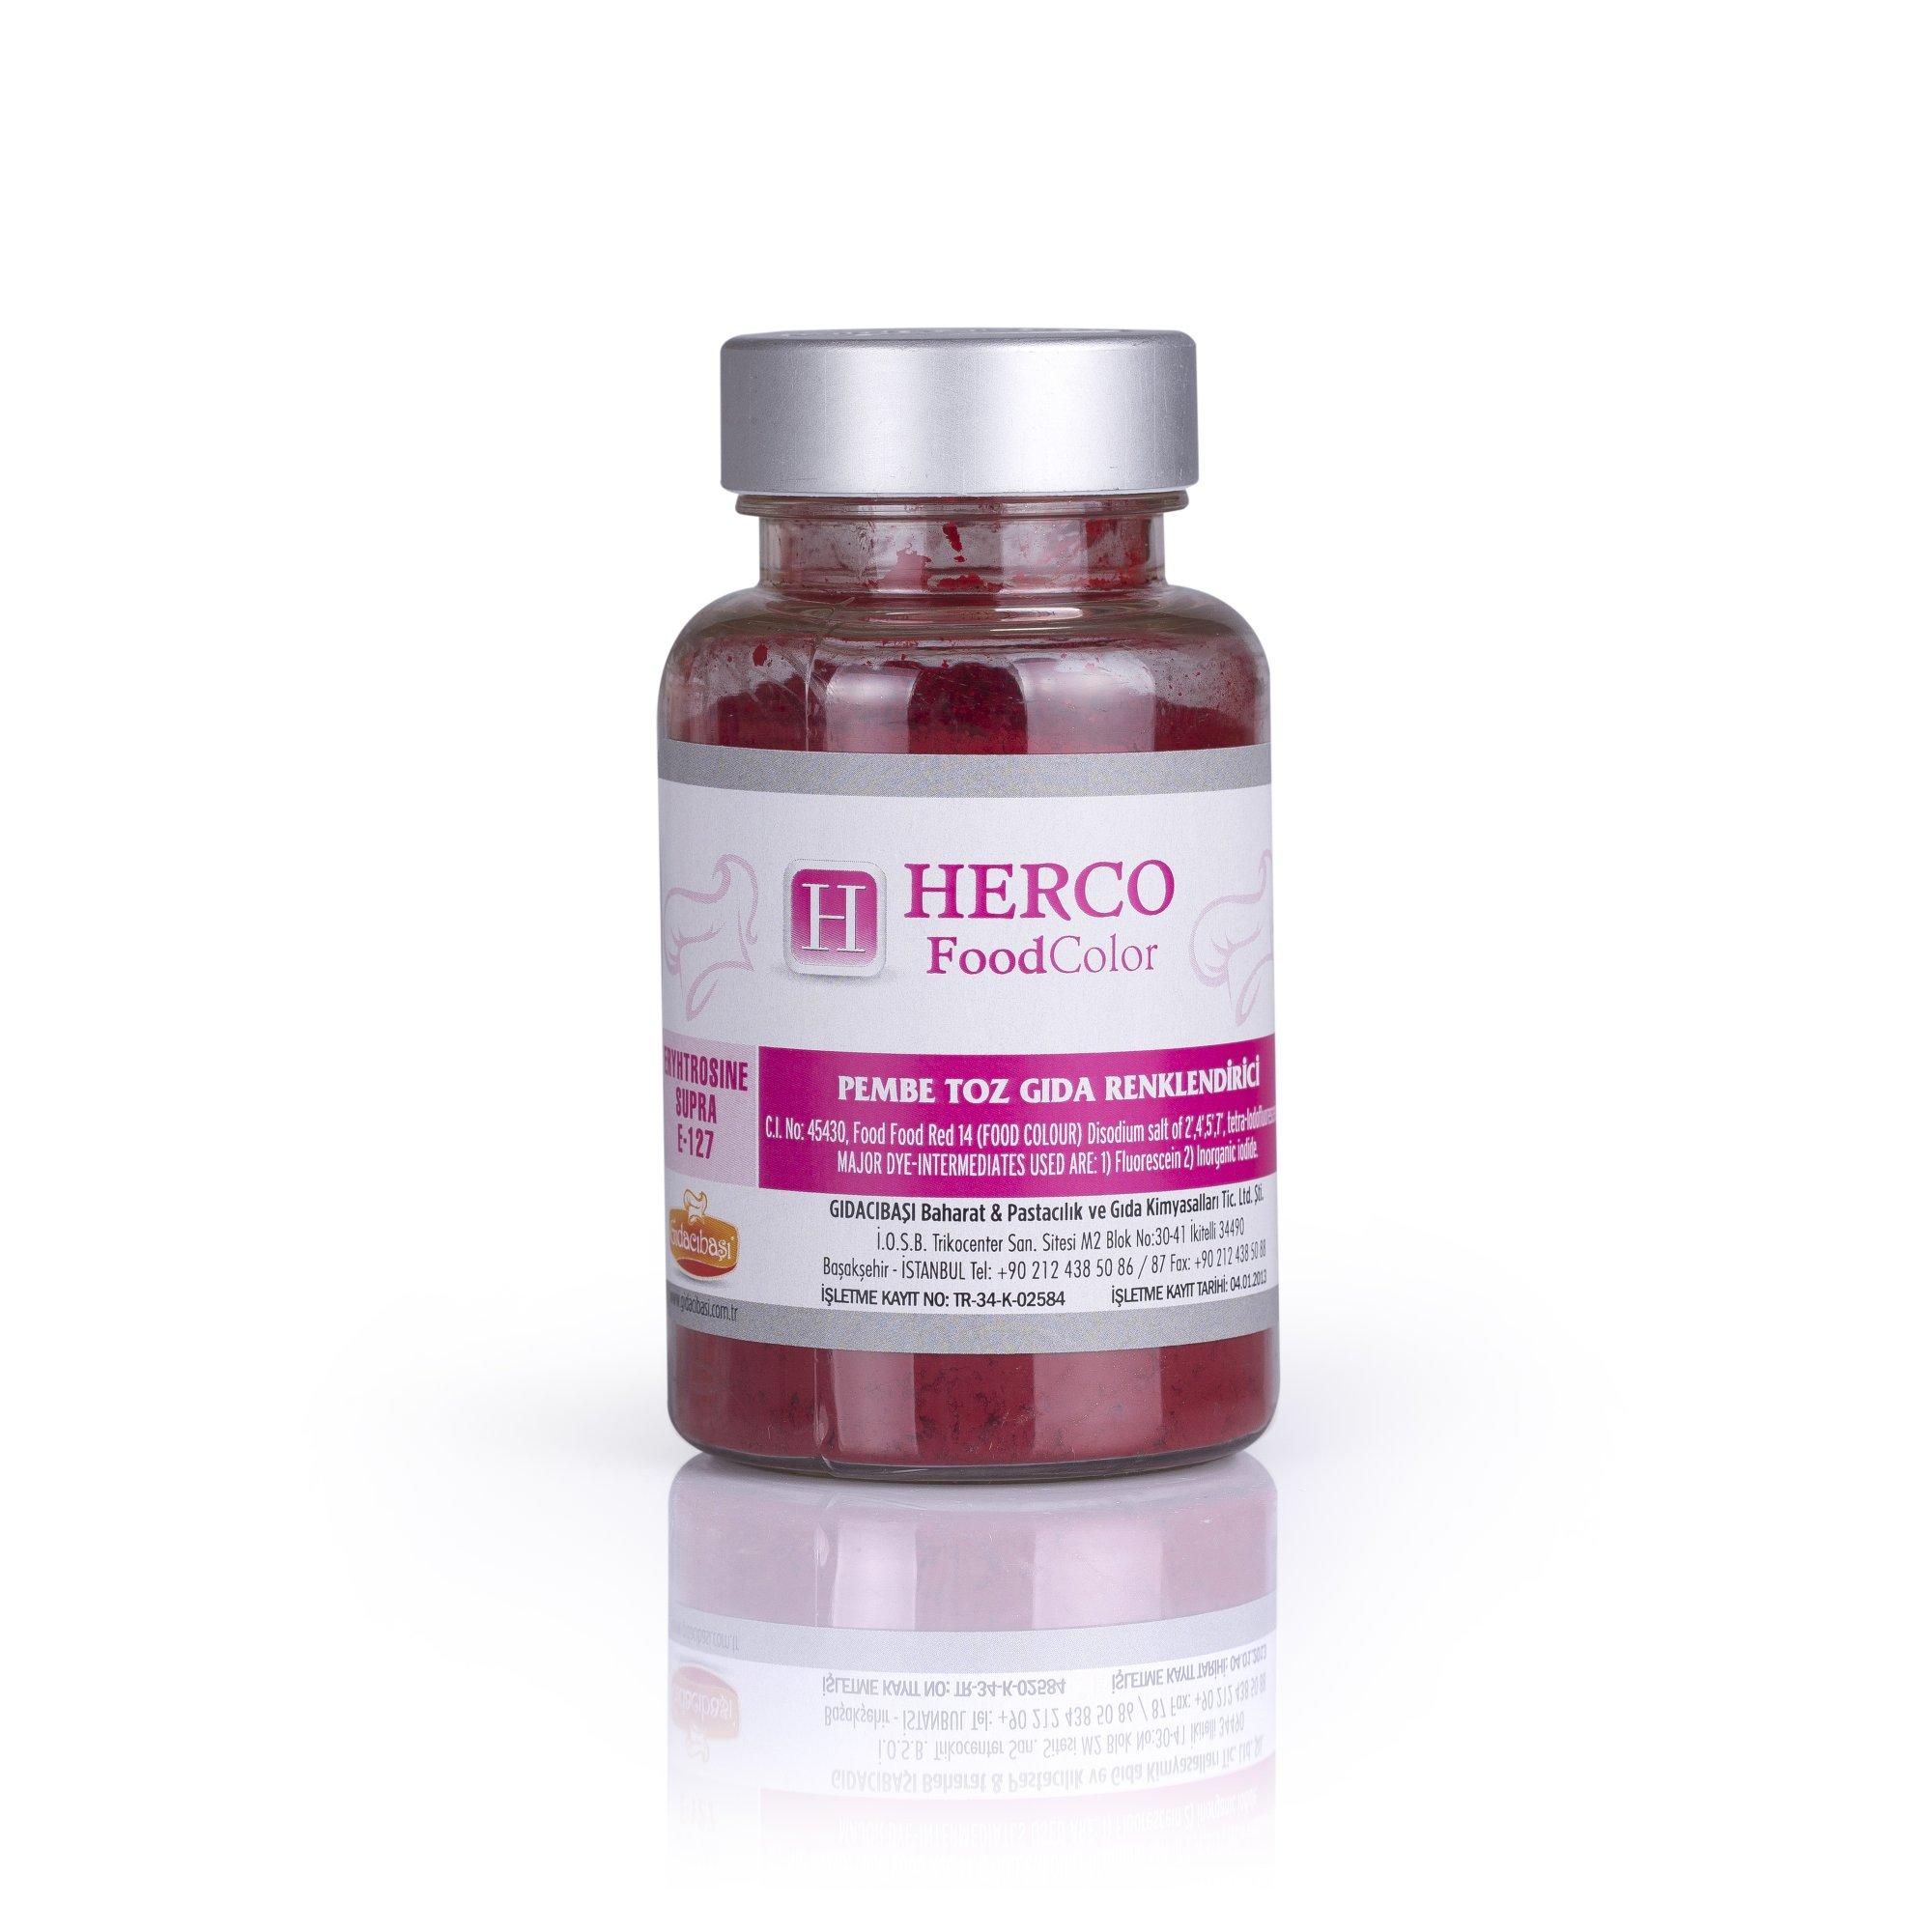 Pembe Toz Gıda Renlendirici - Herco FoodColor